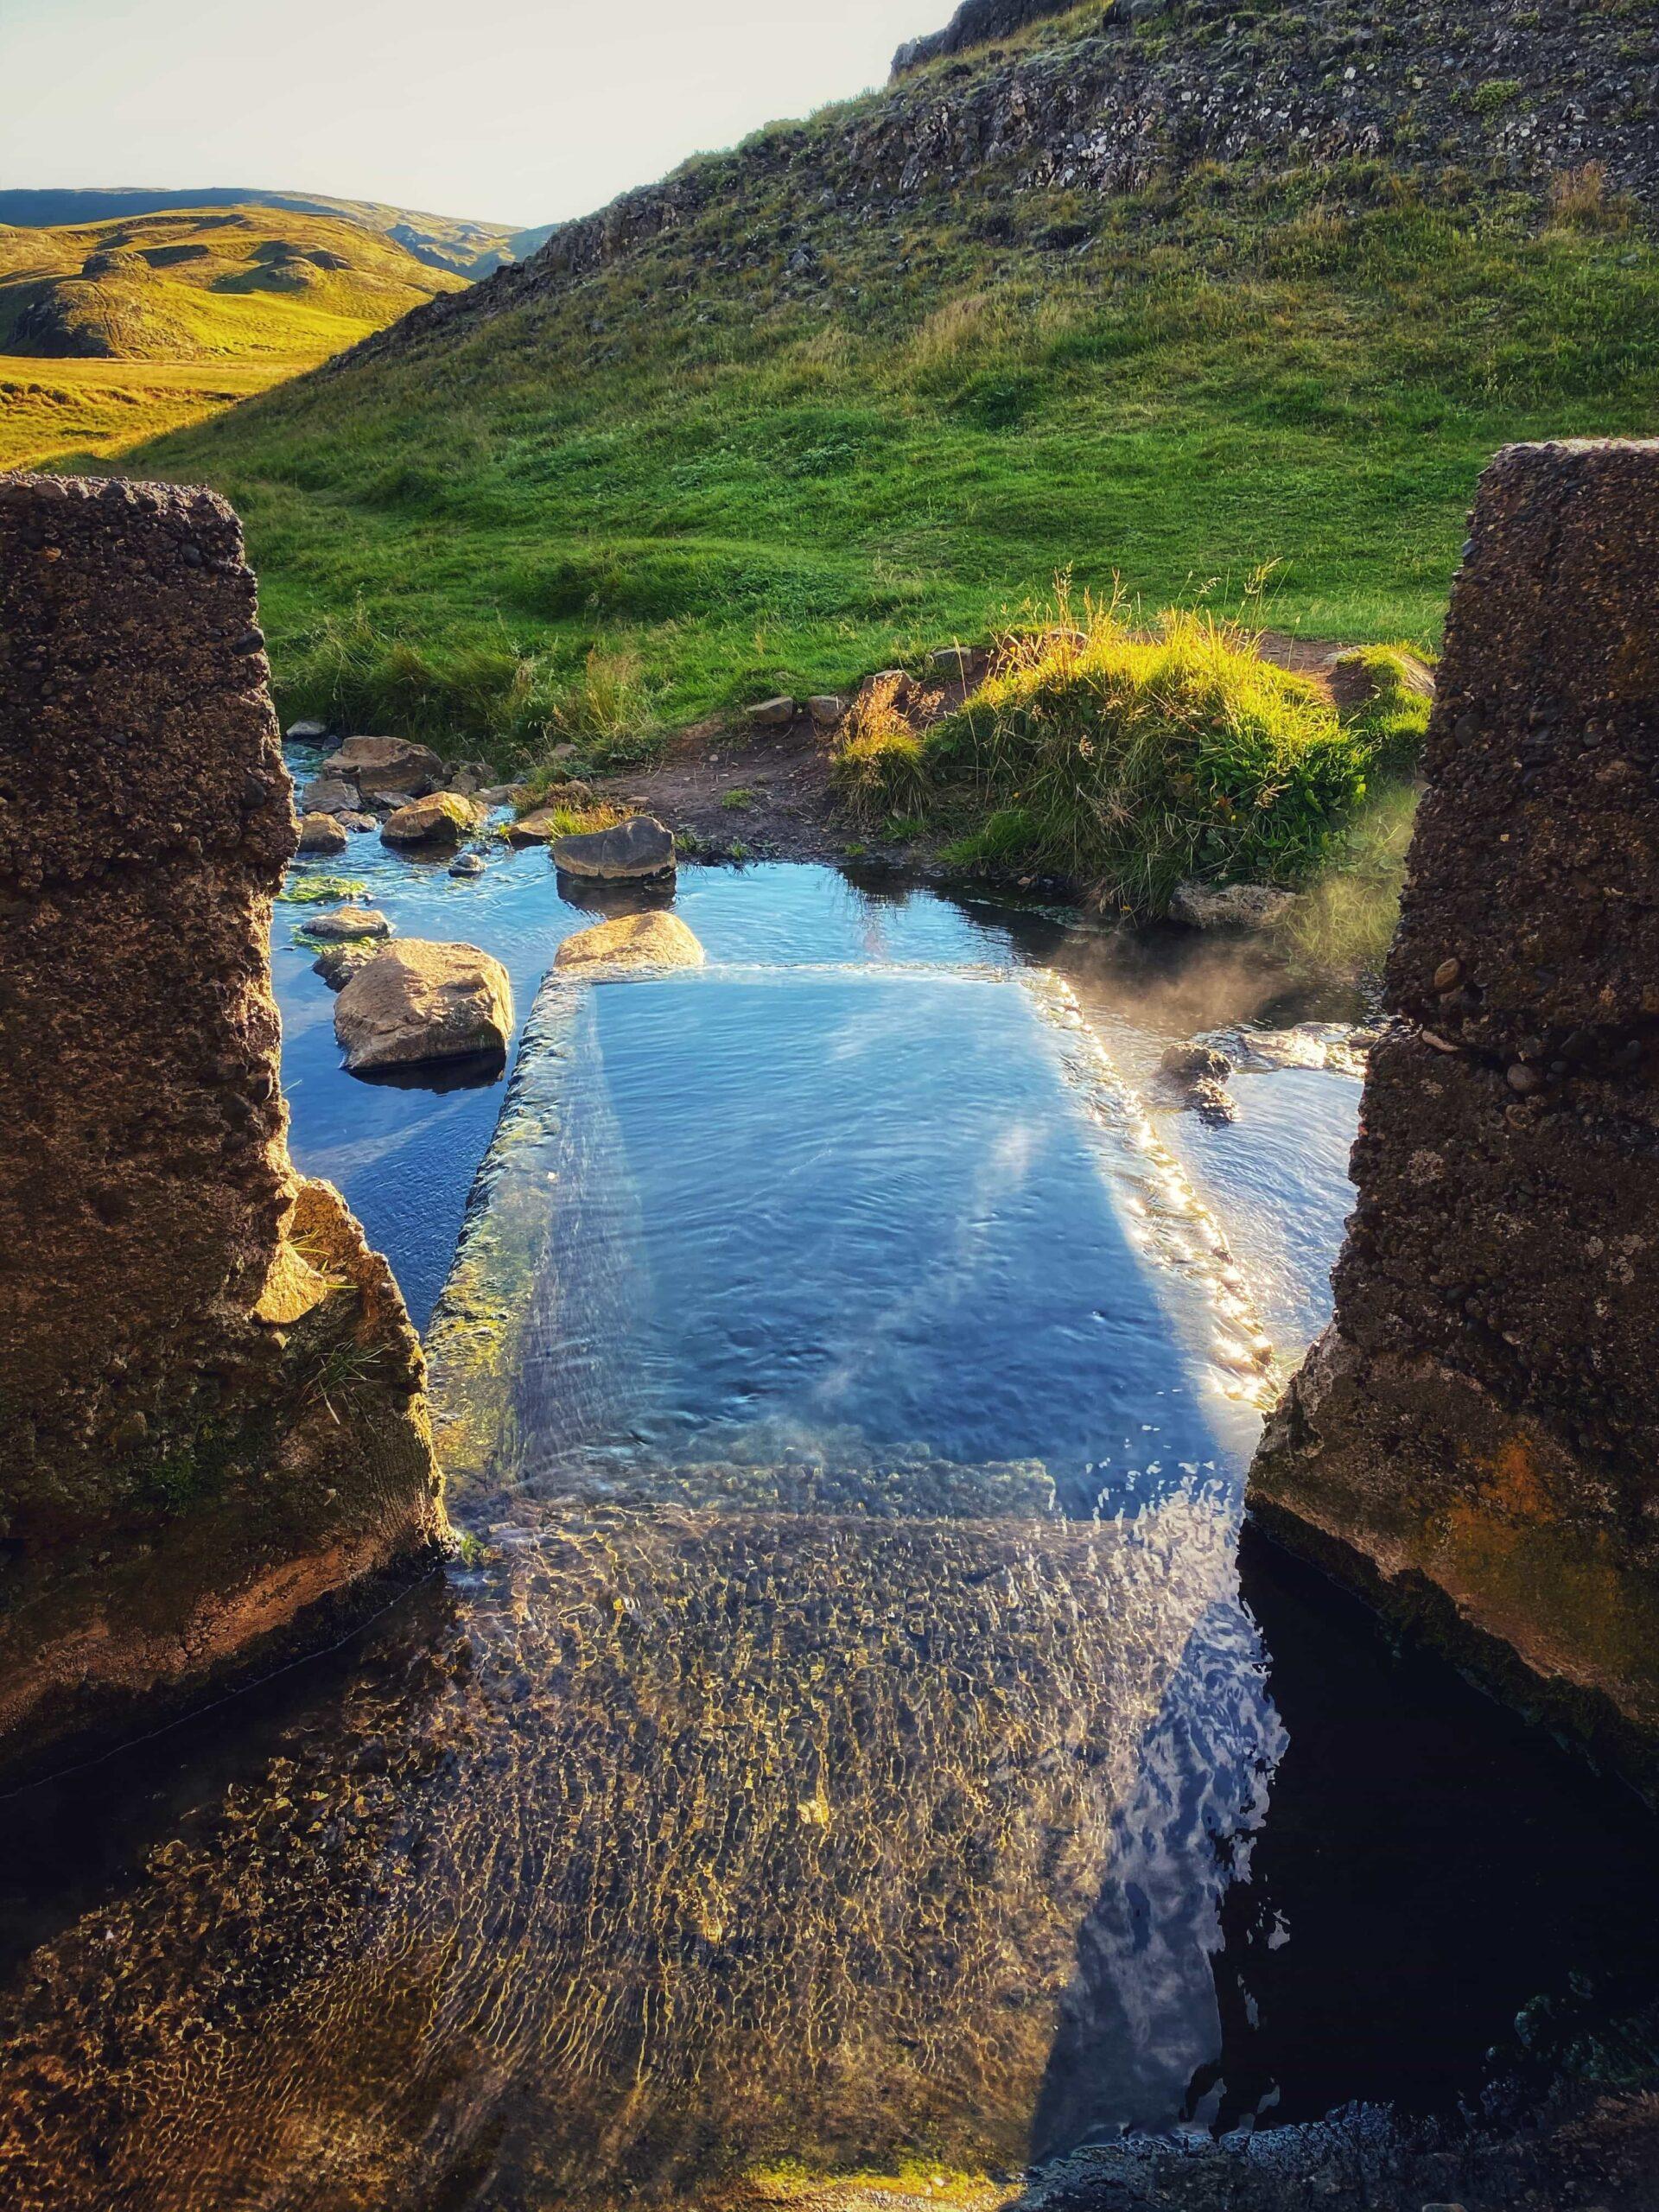 Hrunalaug hot spring - Flúðir Golden Circle